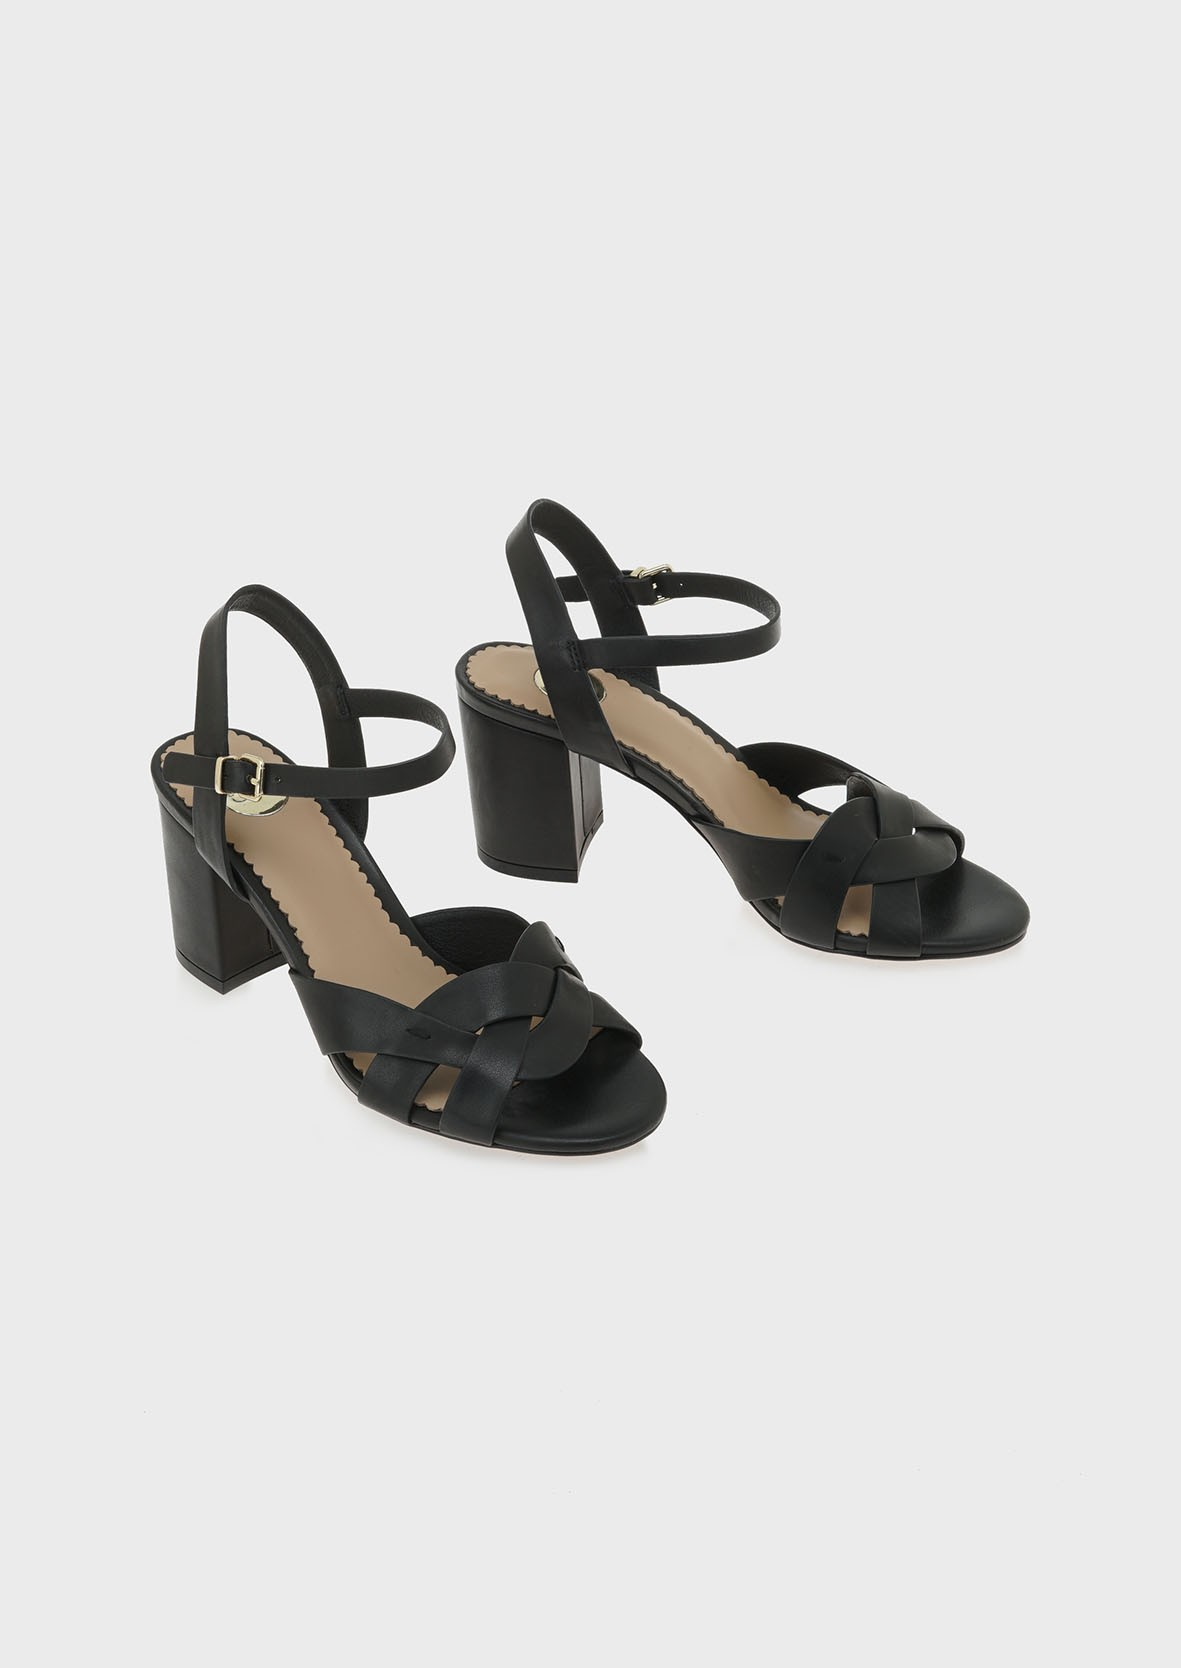 EXE Shoes Πέδιλα Γυναικεία ADELE-267 Μαύρο M47002674001